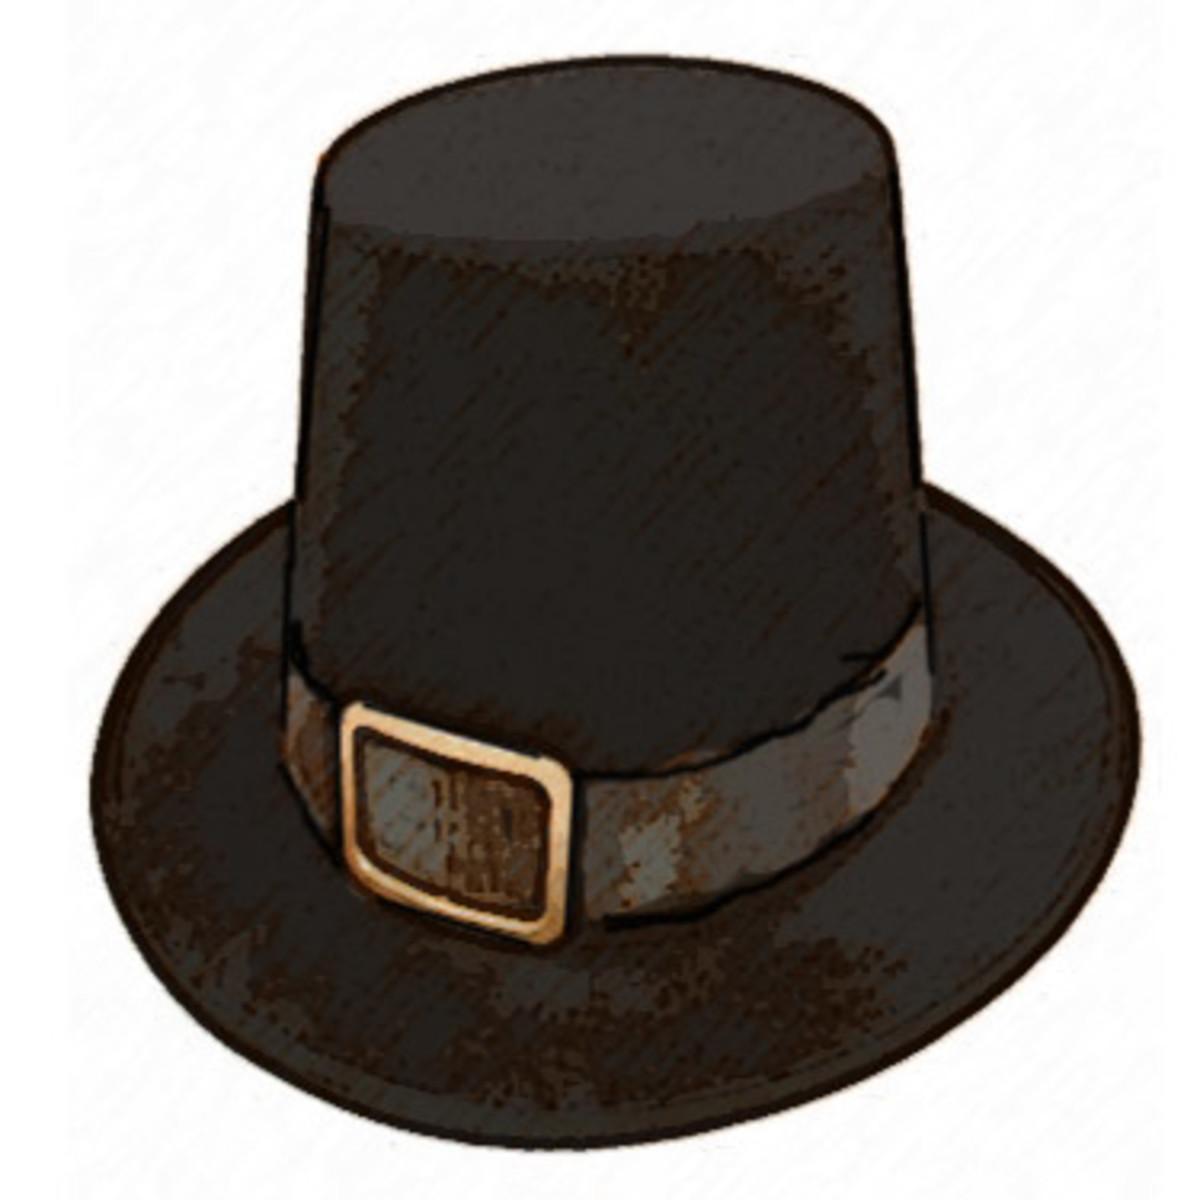 Drawing of the basic American Pilgrim's Hat